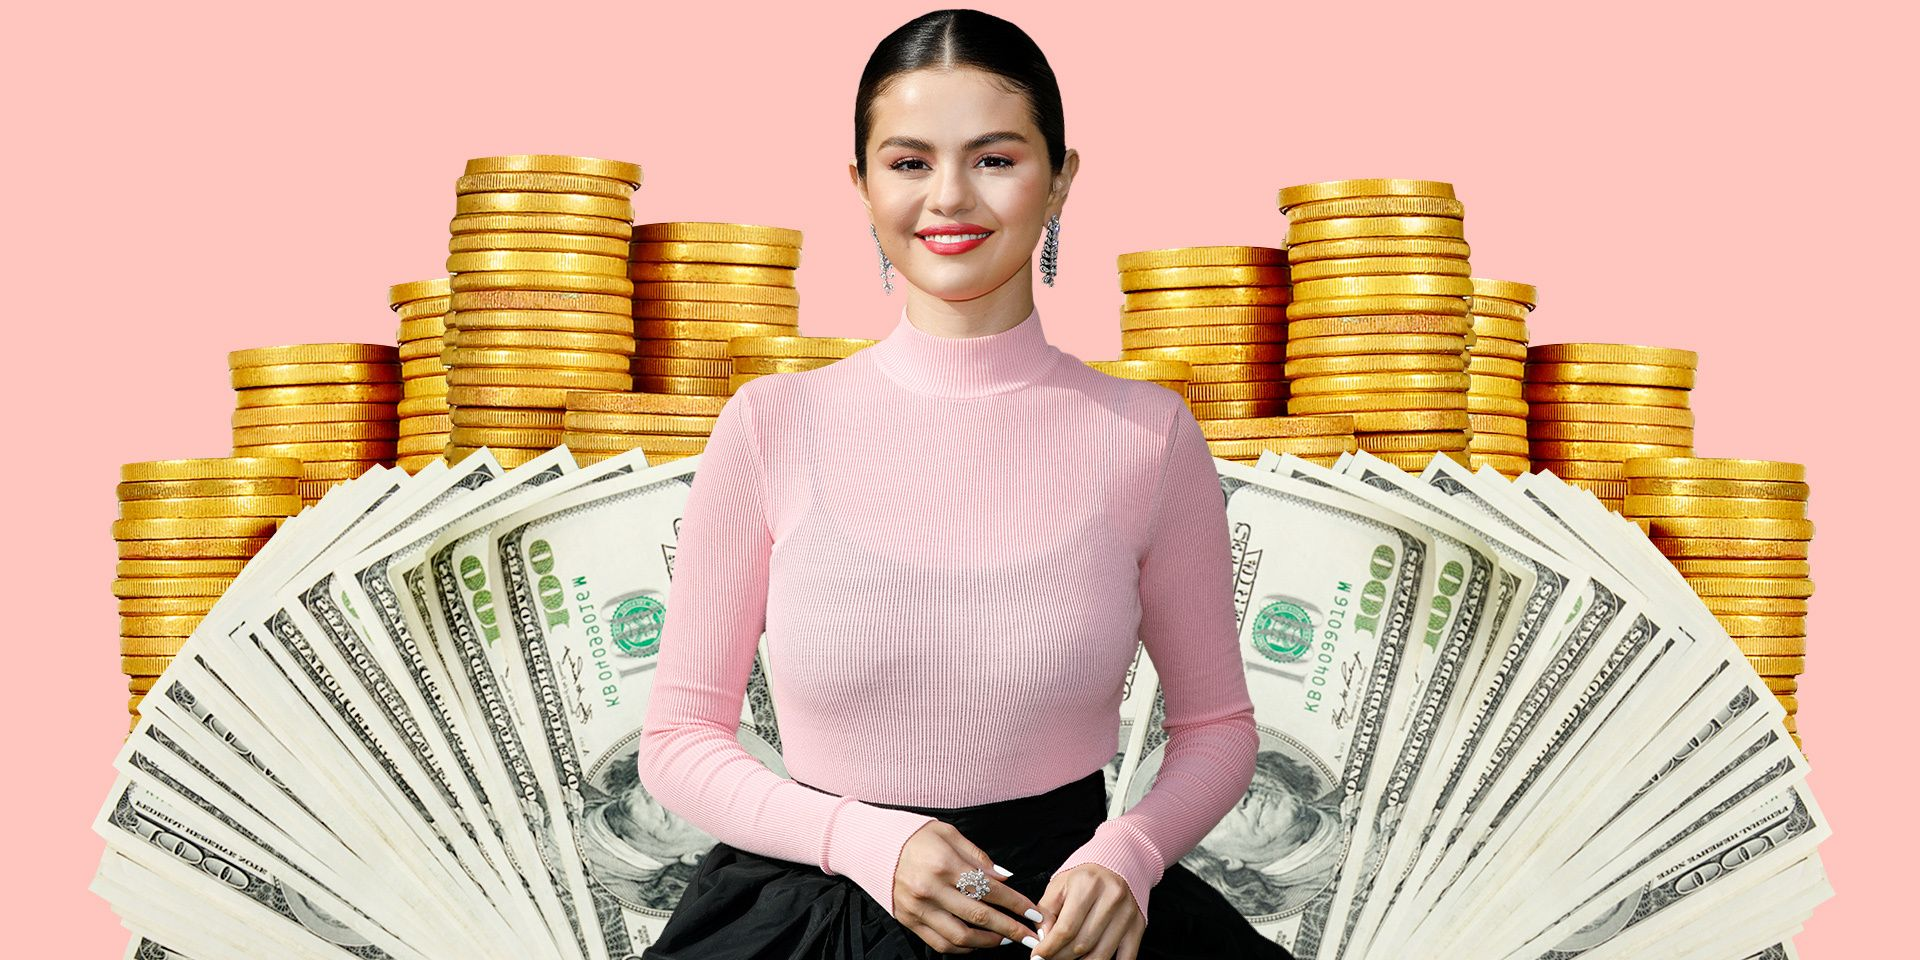 Selena Gomez's Net Worth Will Blow Your Mind - Selena Gomez Age and Net  Worth